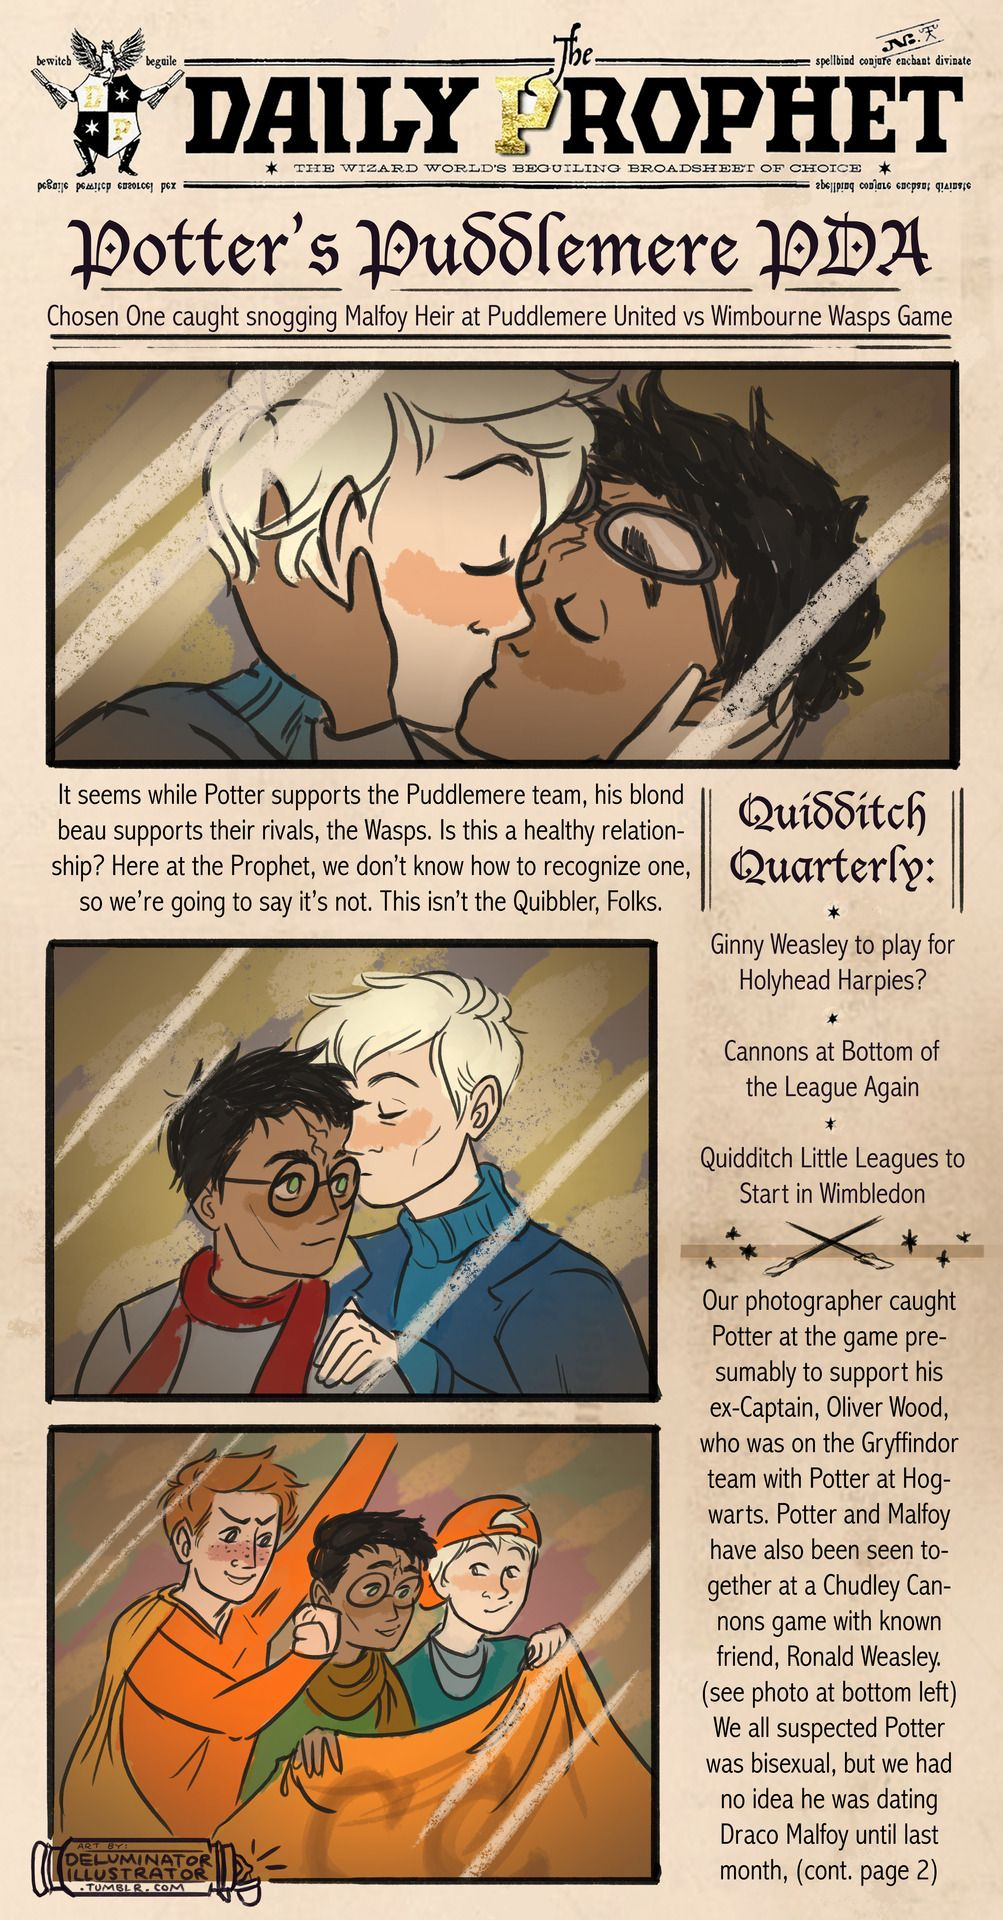 Drarry Fanfiction Recblog Harry Potter Fanfiction Harry Potter Puns Harry Potter Texts